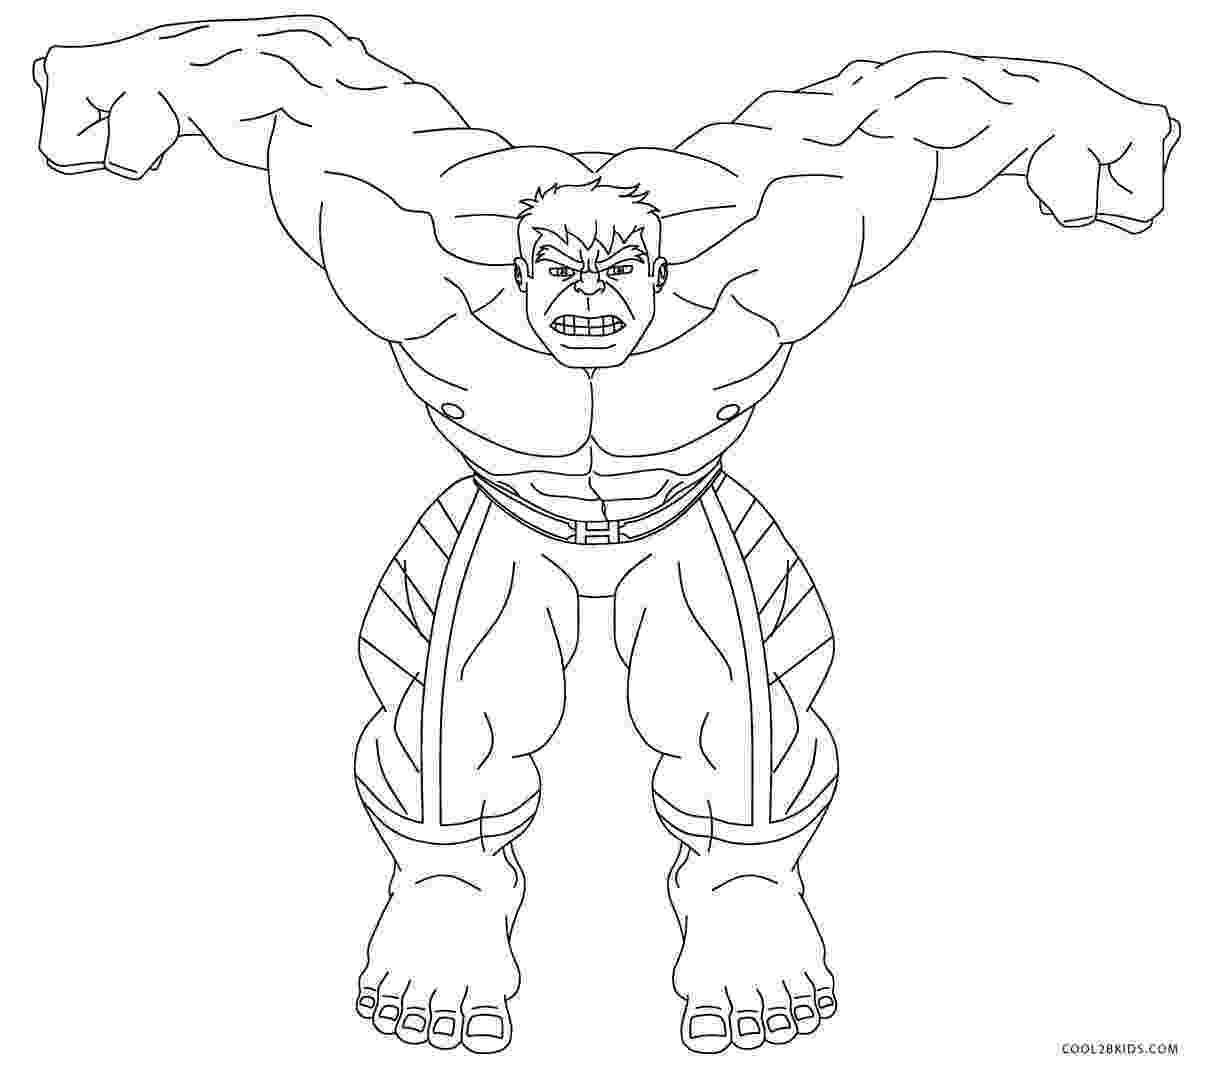 hulk coloring book hulk39s punch coloring pages hellokidscom hulk book coloring